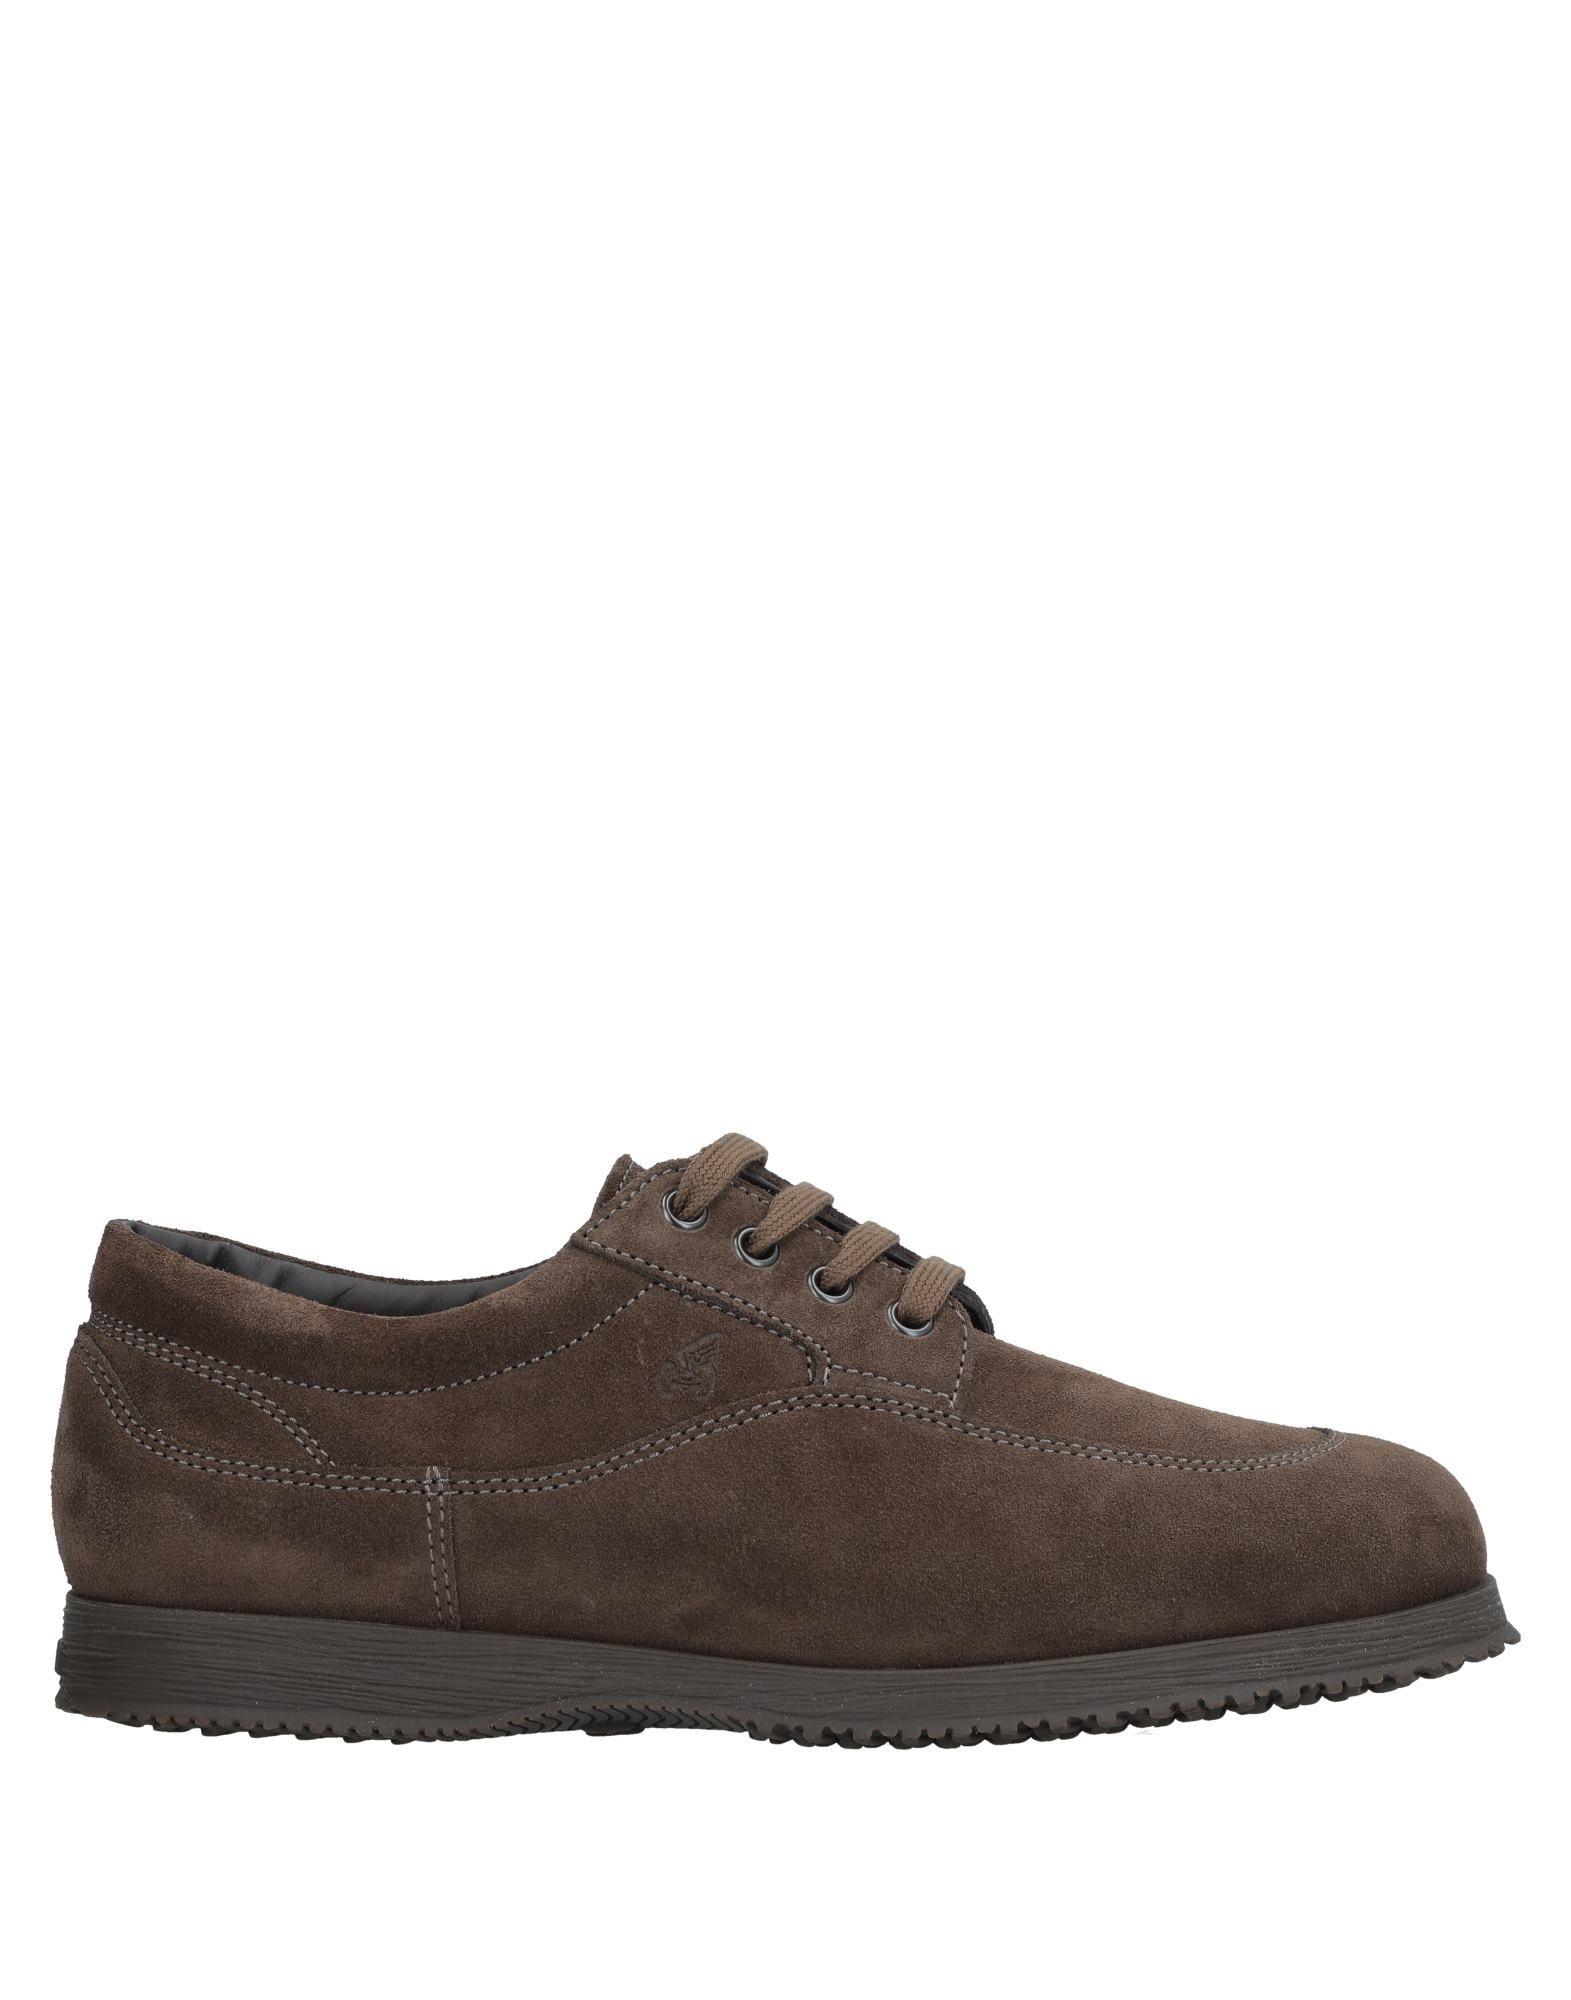 Hogan Sneakers Herren  11540238PF Gute Qualität beliebte Schuhe